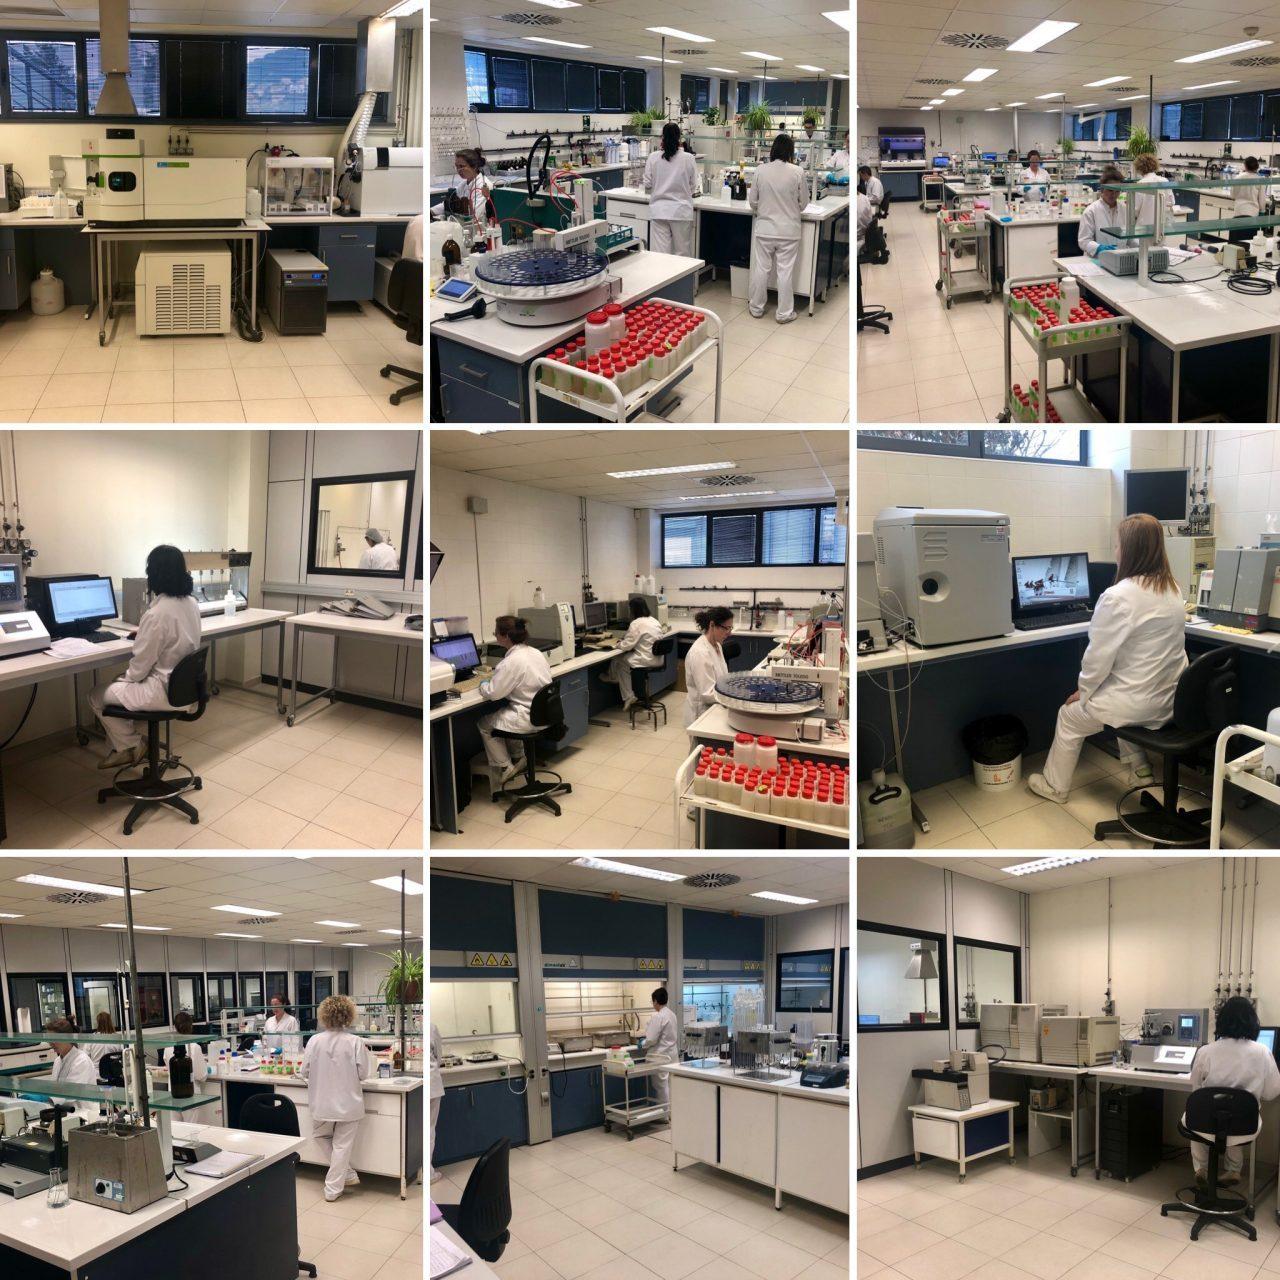 LabStenco1-1280x1280.jpg